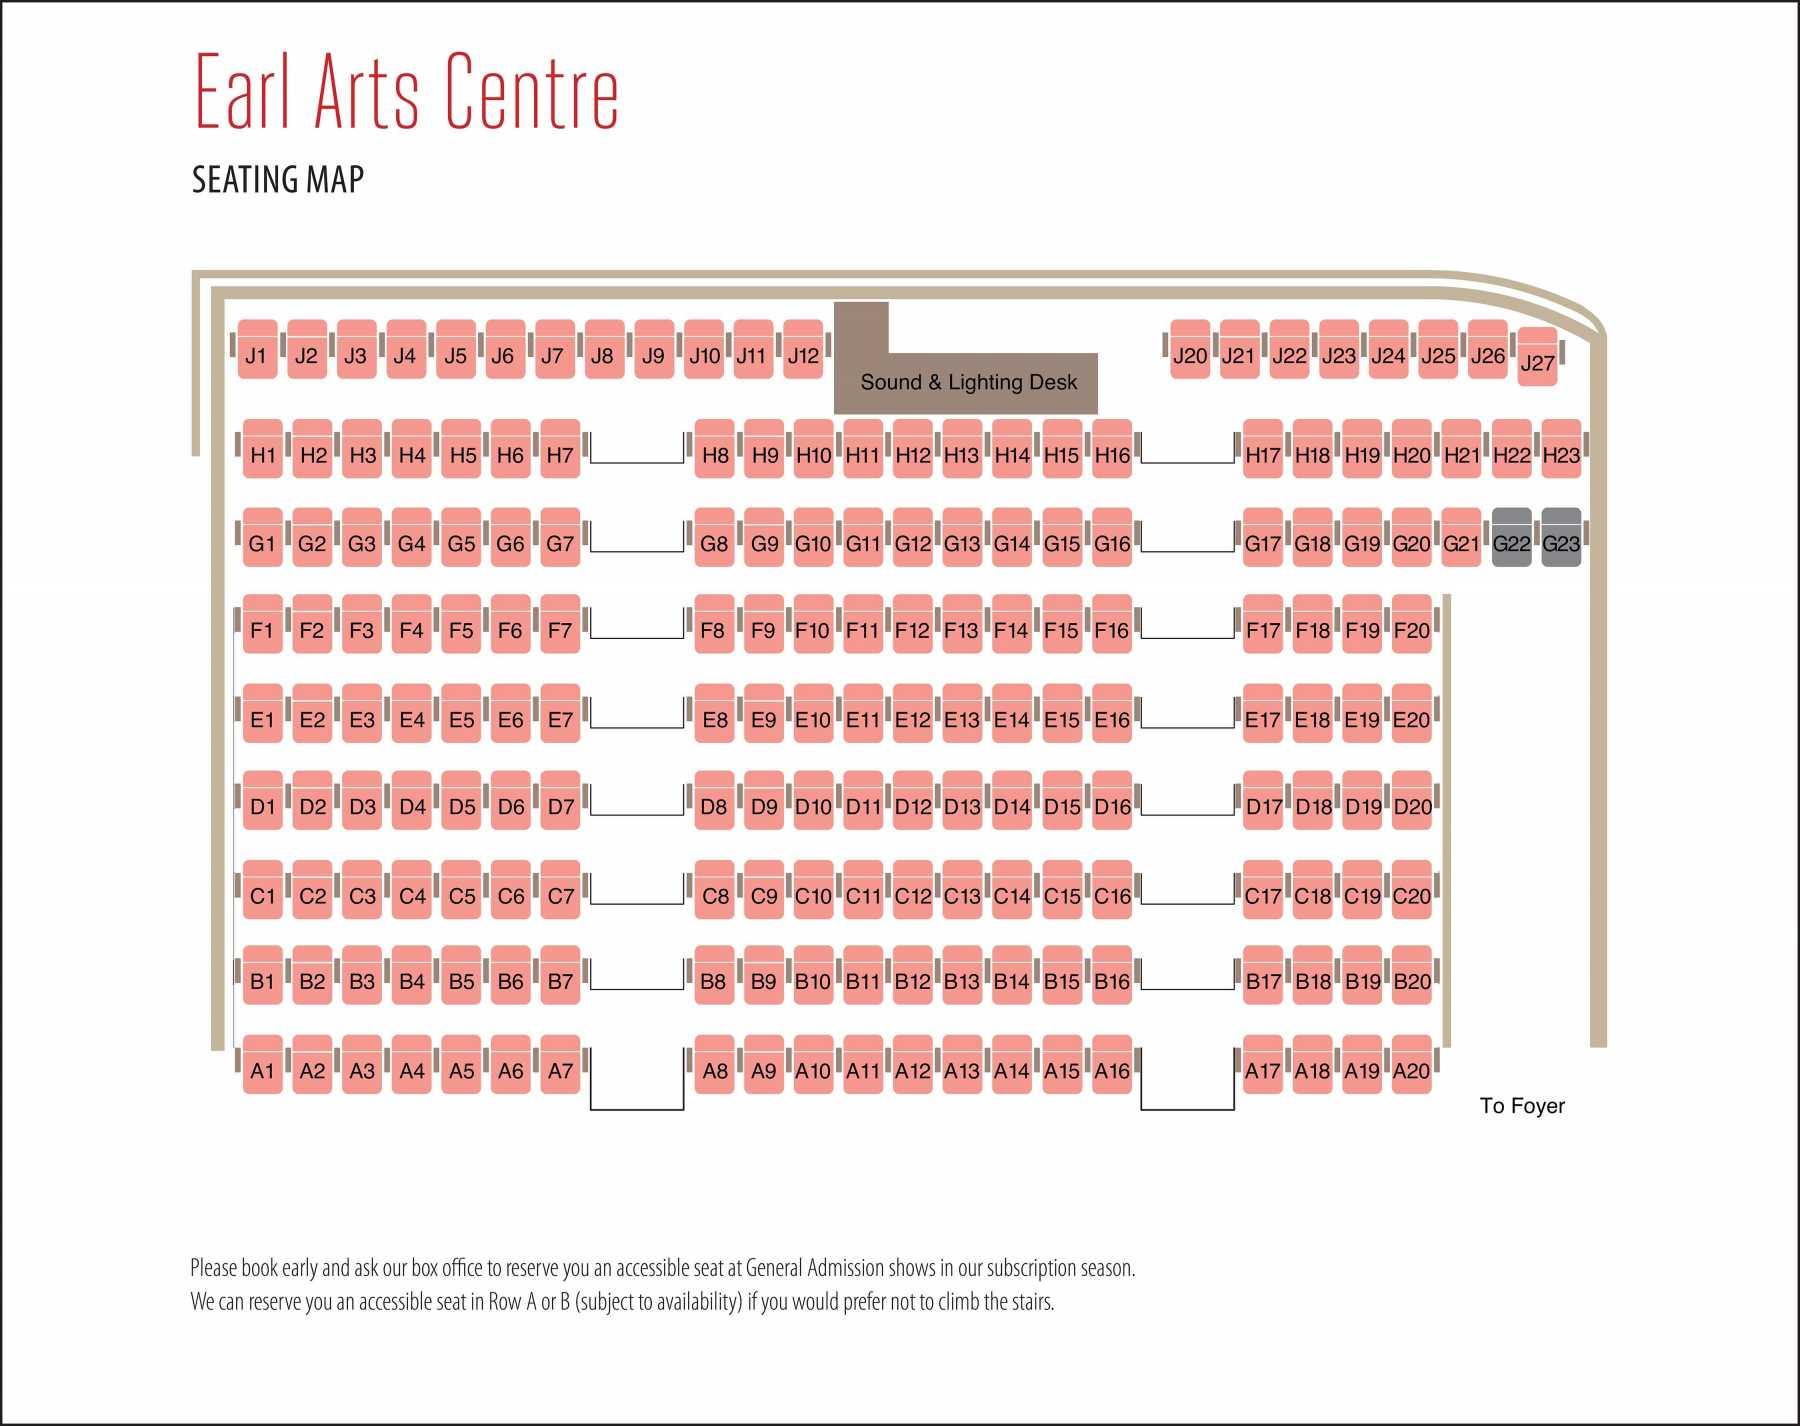 Mt Baker Theatre Seating Chart Wwwmiifotoscom